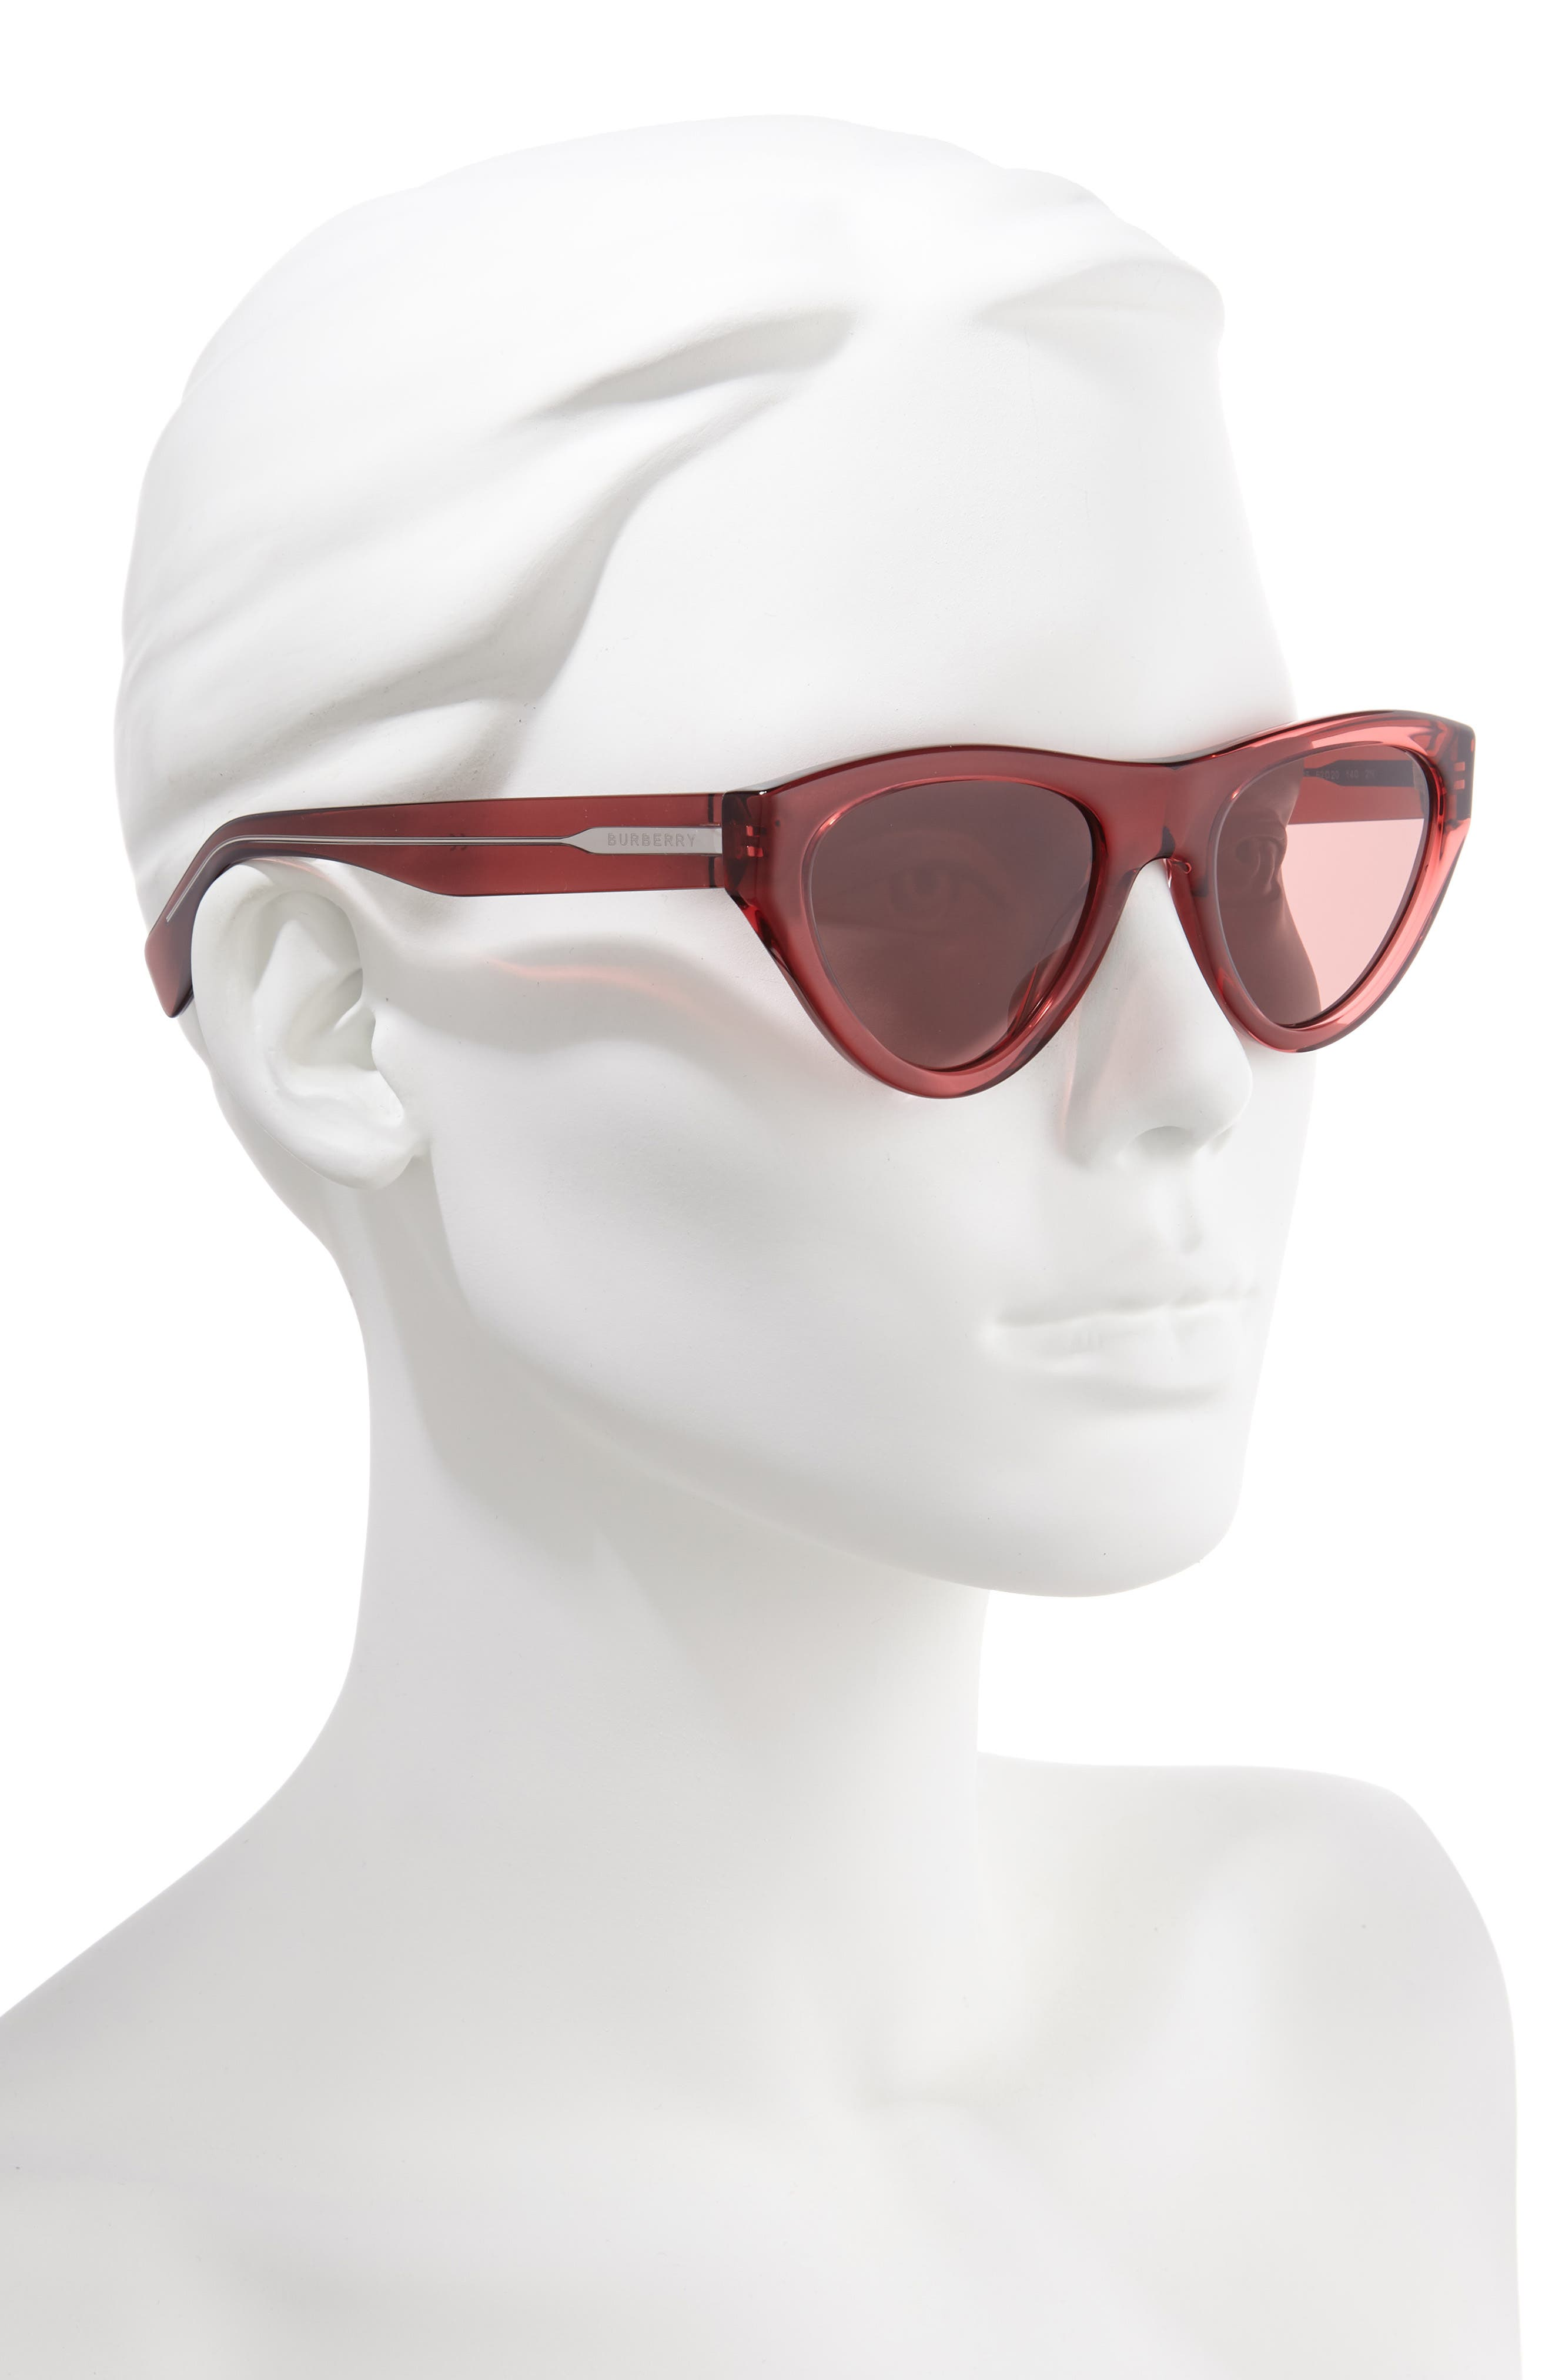 8244ee64a8 Burberry Women s Cat-Eye Sunglasses